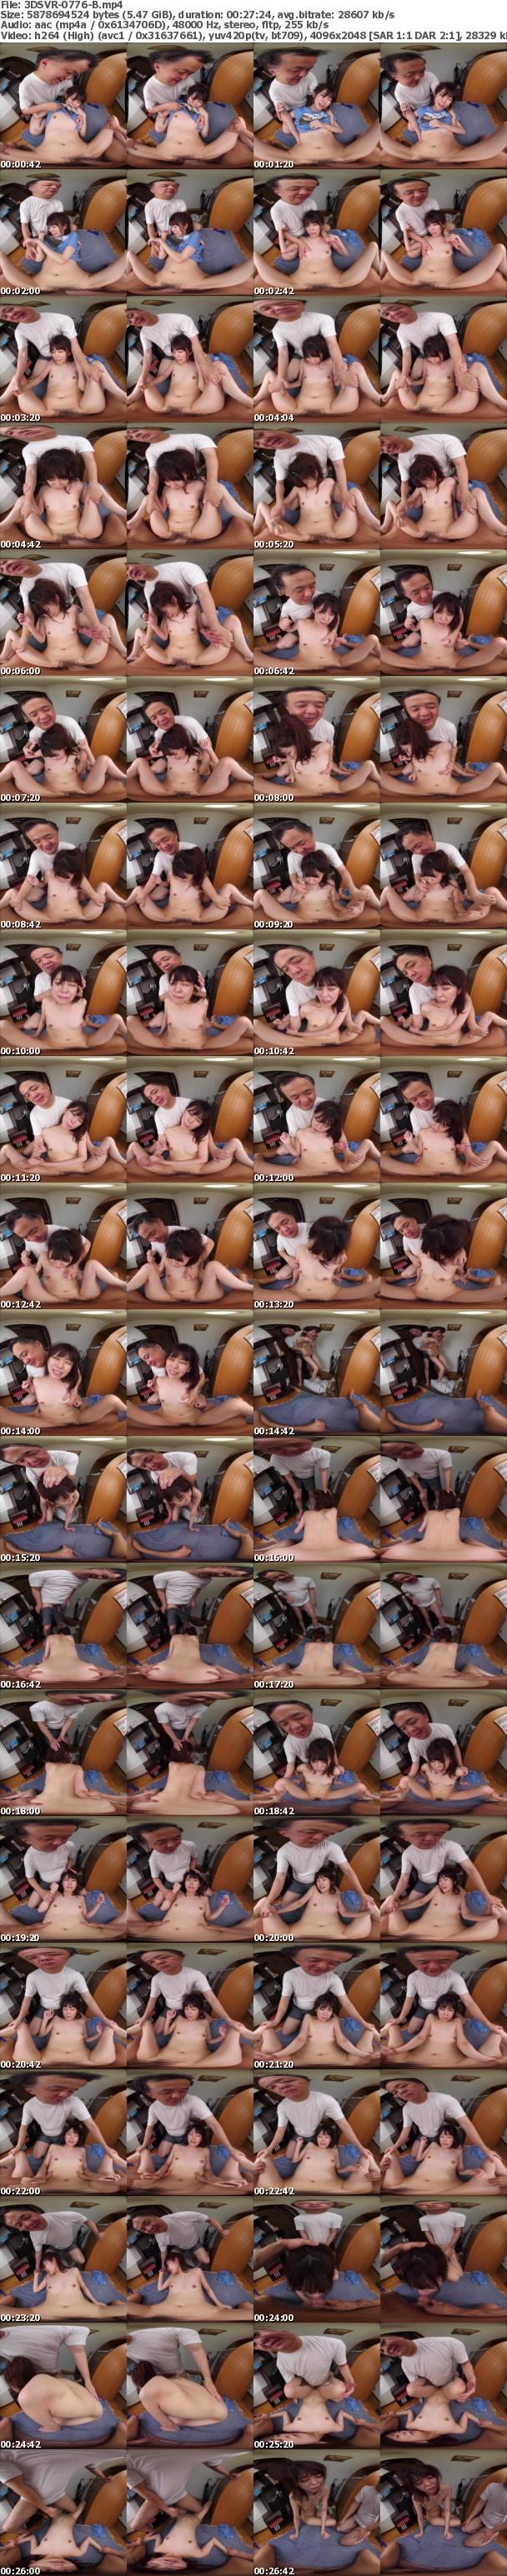 (VR) 3DSVR-0776 【追跡視点】ランドリーで見つけた女子大生 自宅へ押し入り強● ユルユル部屋着、ブラ紐、生足、油断しすぎ。…ダメだ…どうしてもあの娘を妊娠させたい…。